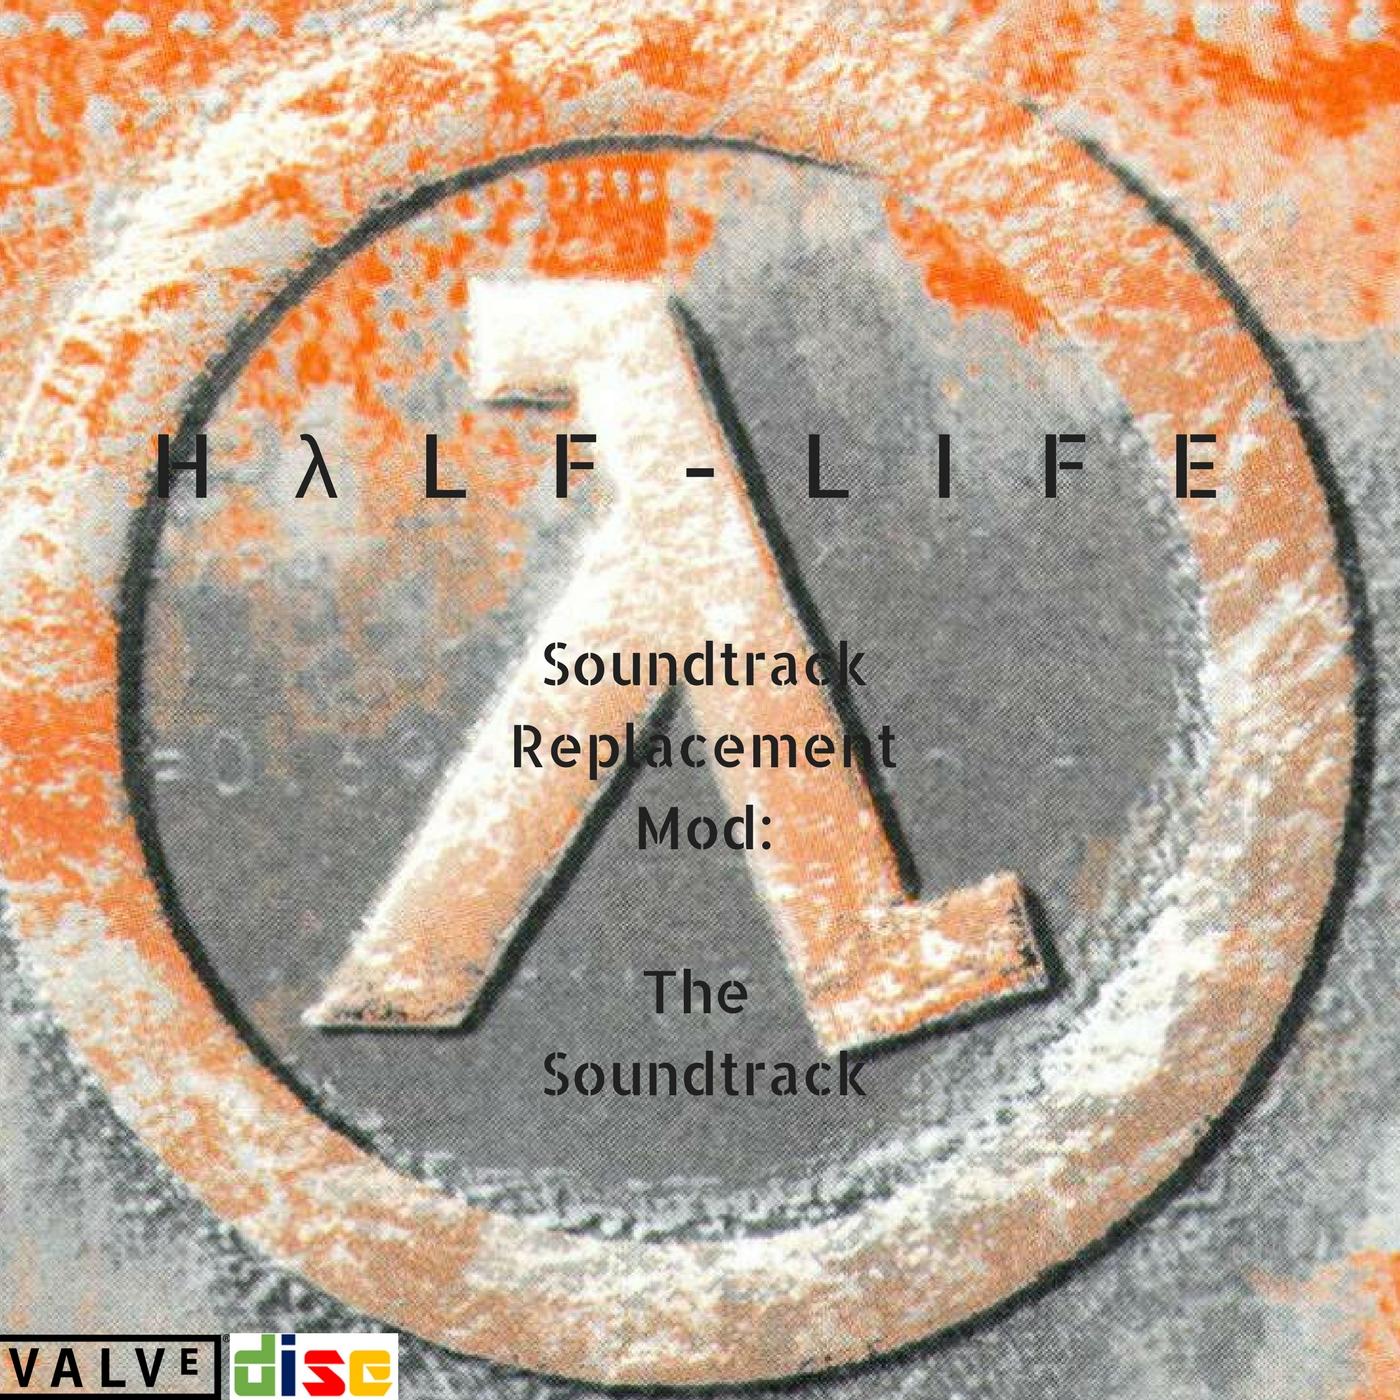 H_L_F_-_L_I_F_E-_SRM_ALBUM_AR.jpg